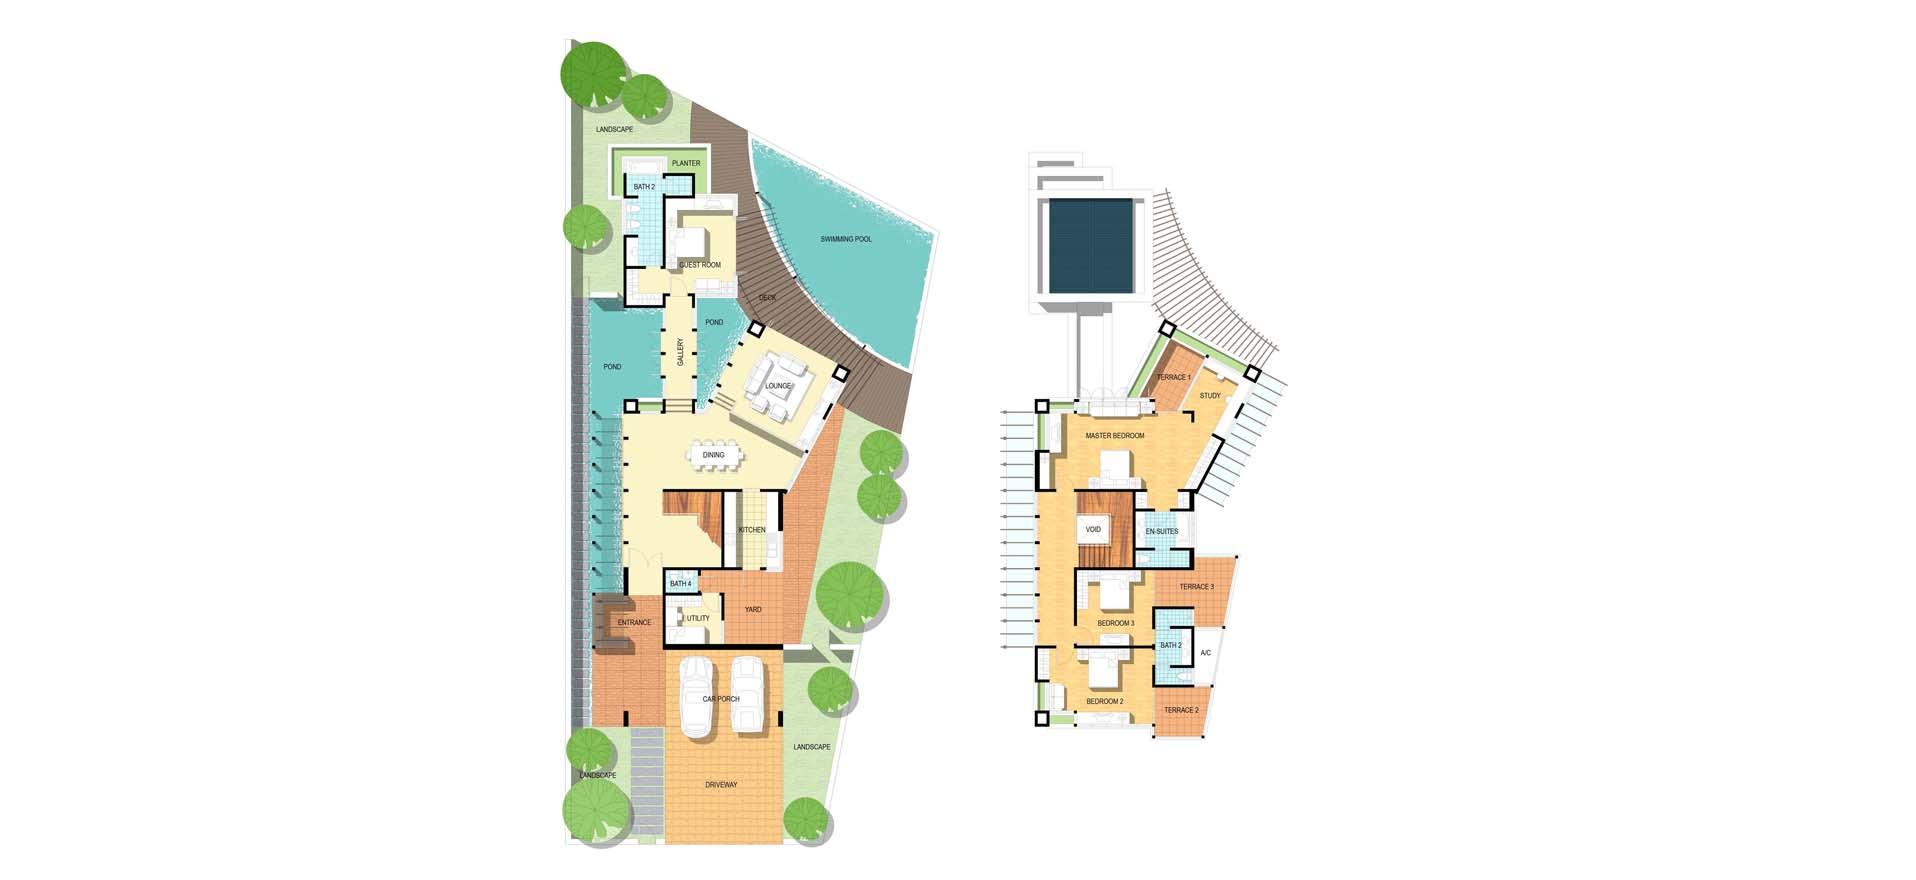 Lot-40 plan-s (2)